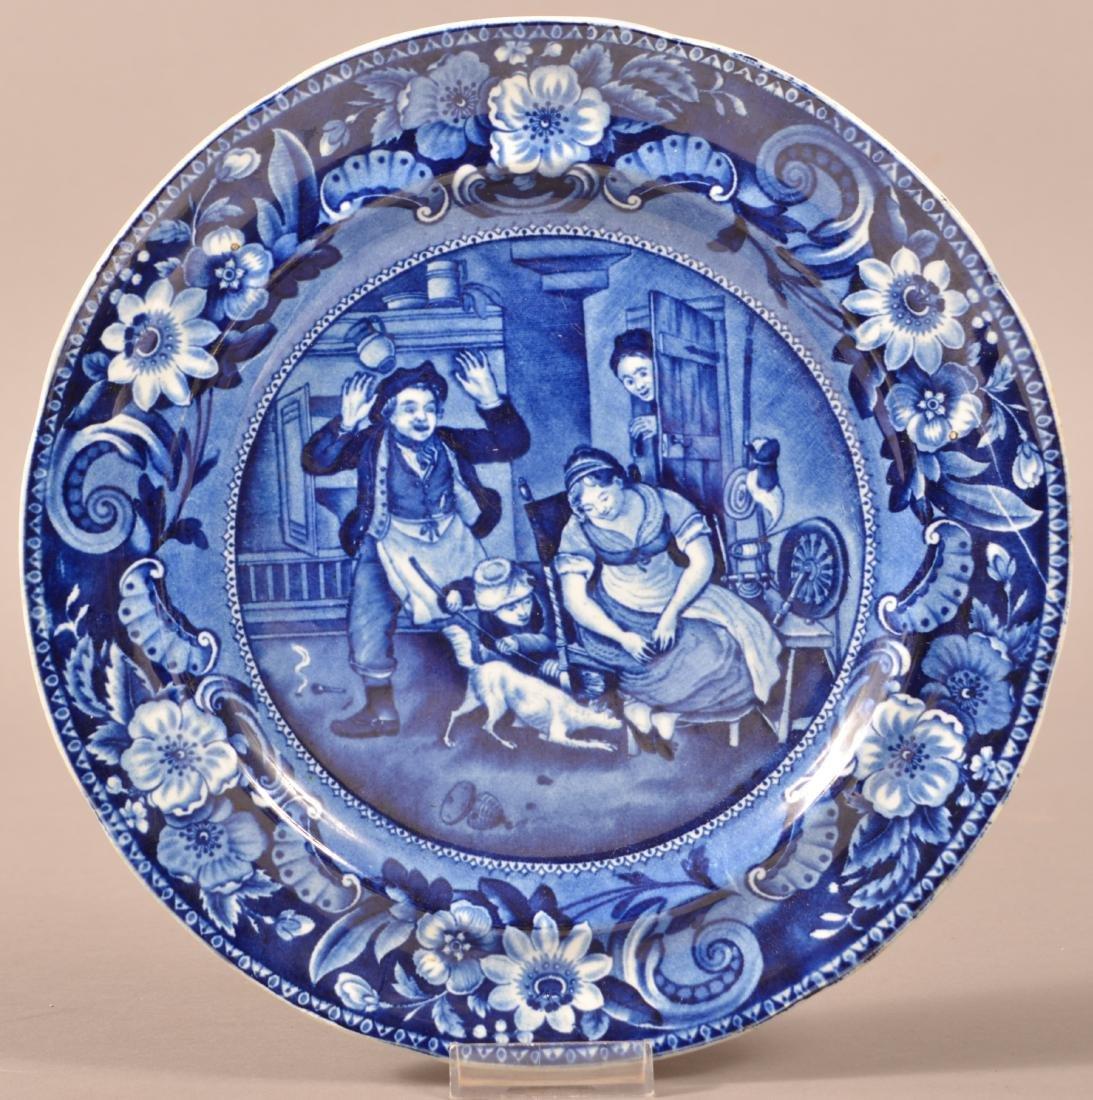 Staffordshire Blue Transfer China Plate.